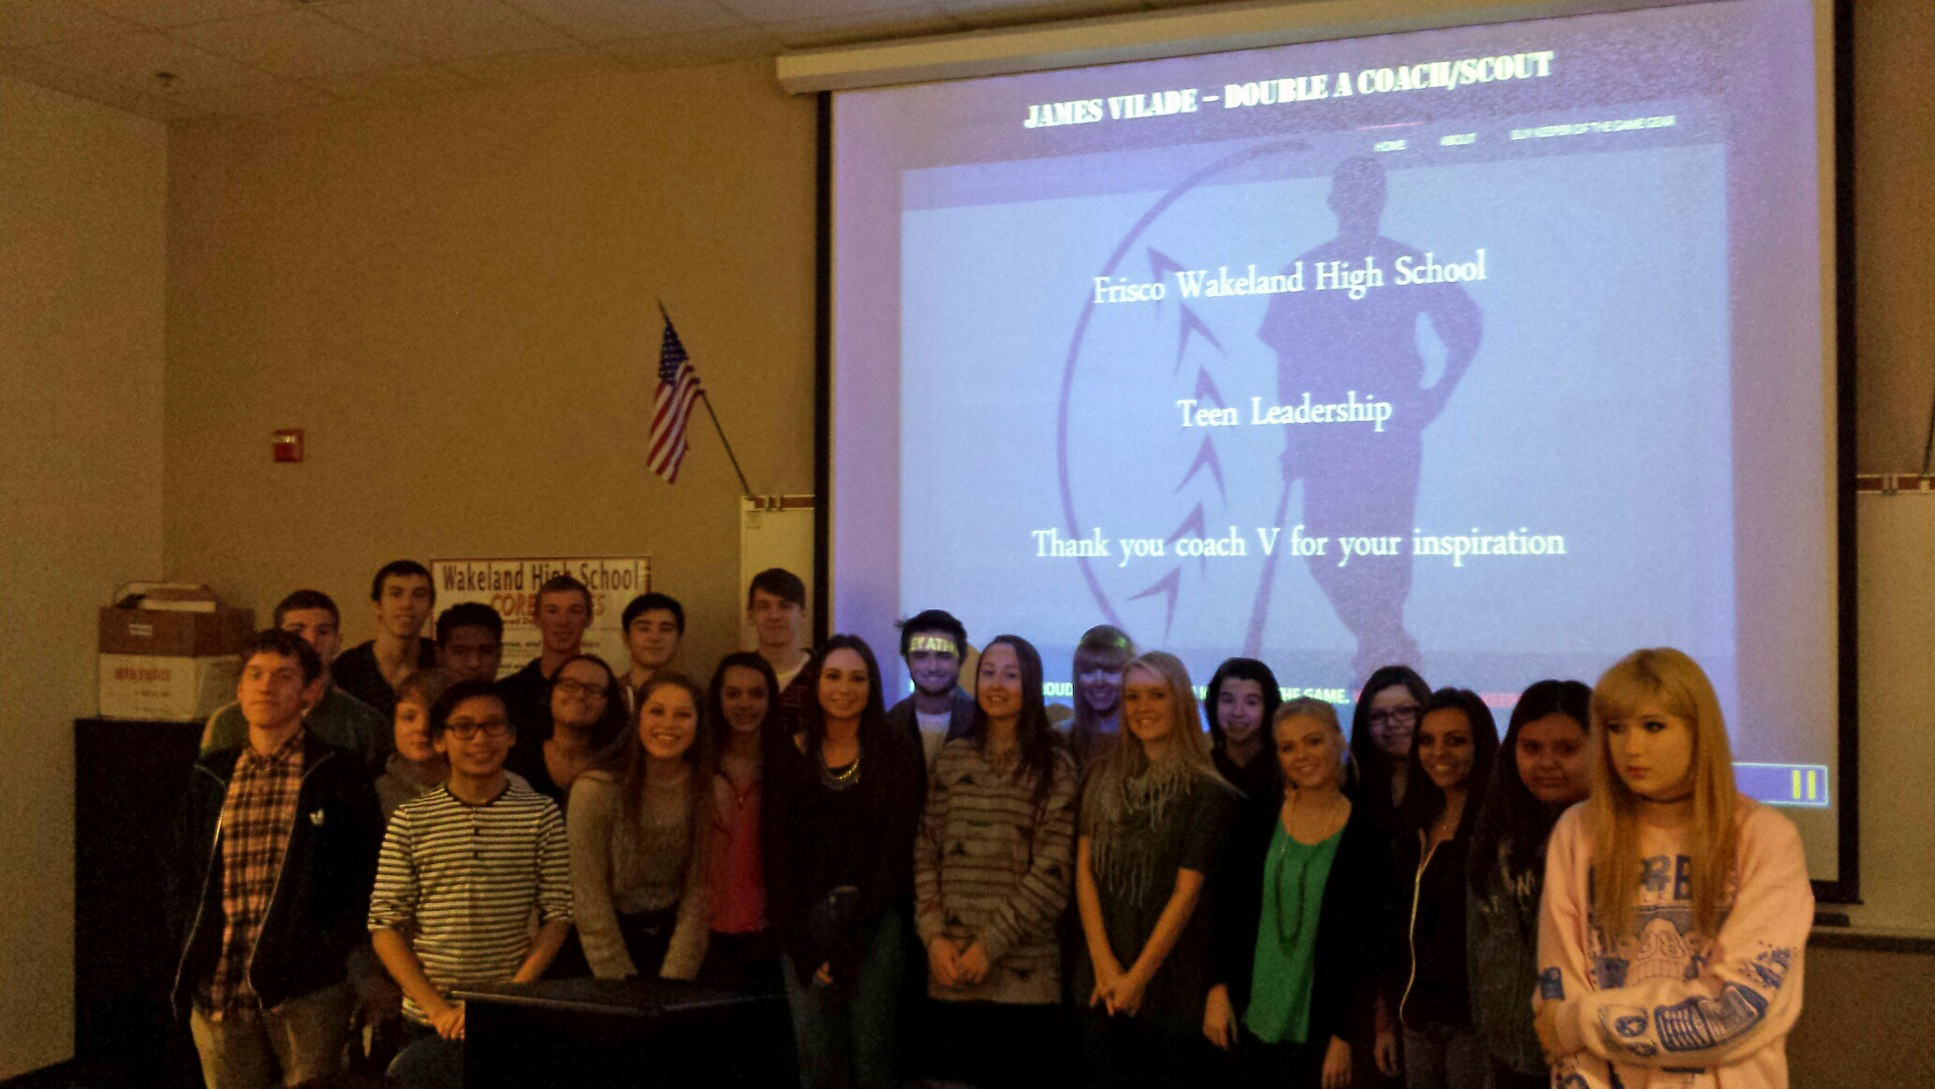 WHS teen leadership1